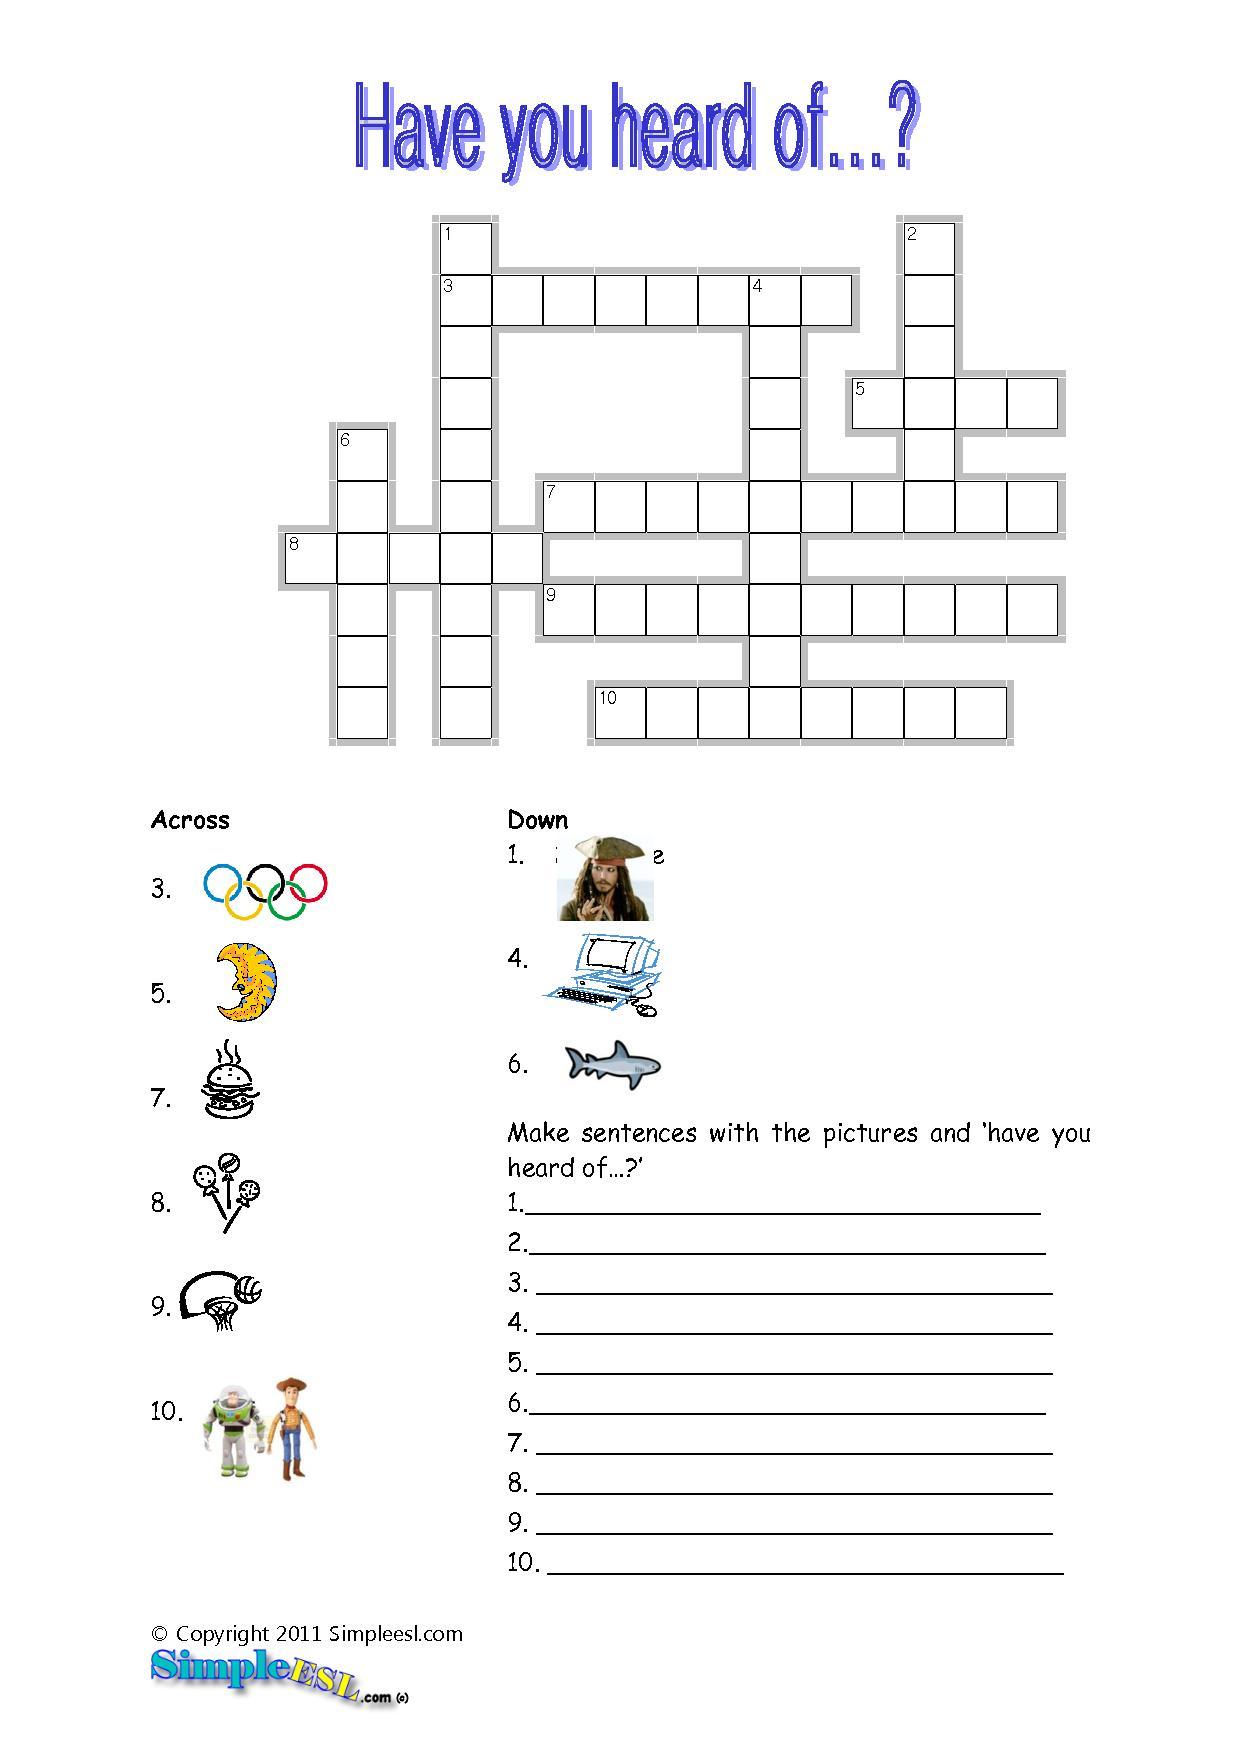 15 Best Photos Of Esl Printable Worksheets Crossword - Printable - Printable Crossword Puzzles For Esl Students